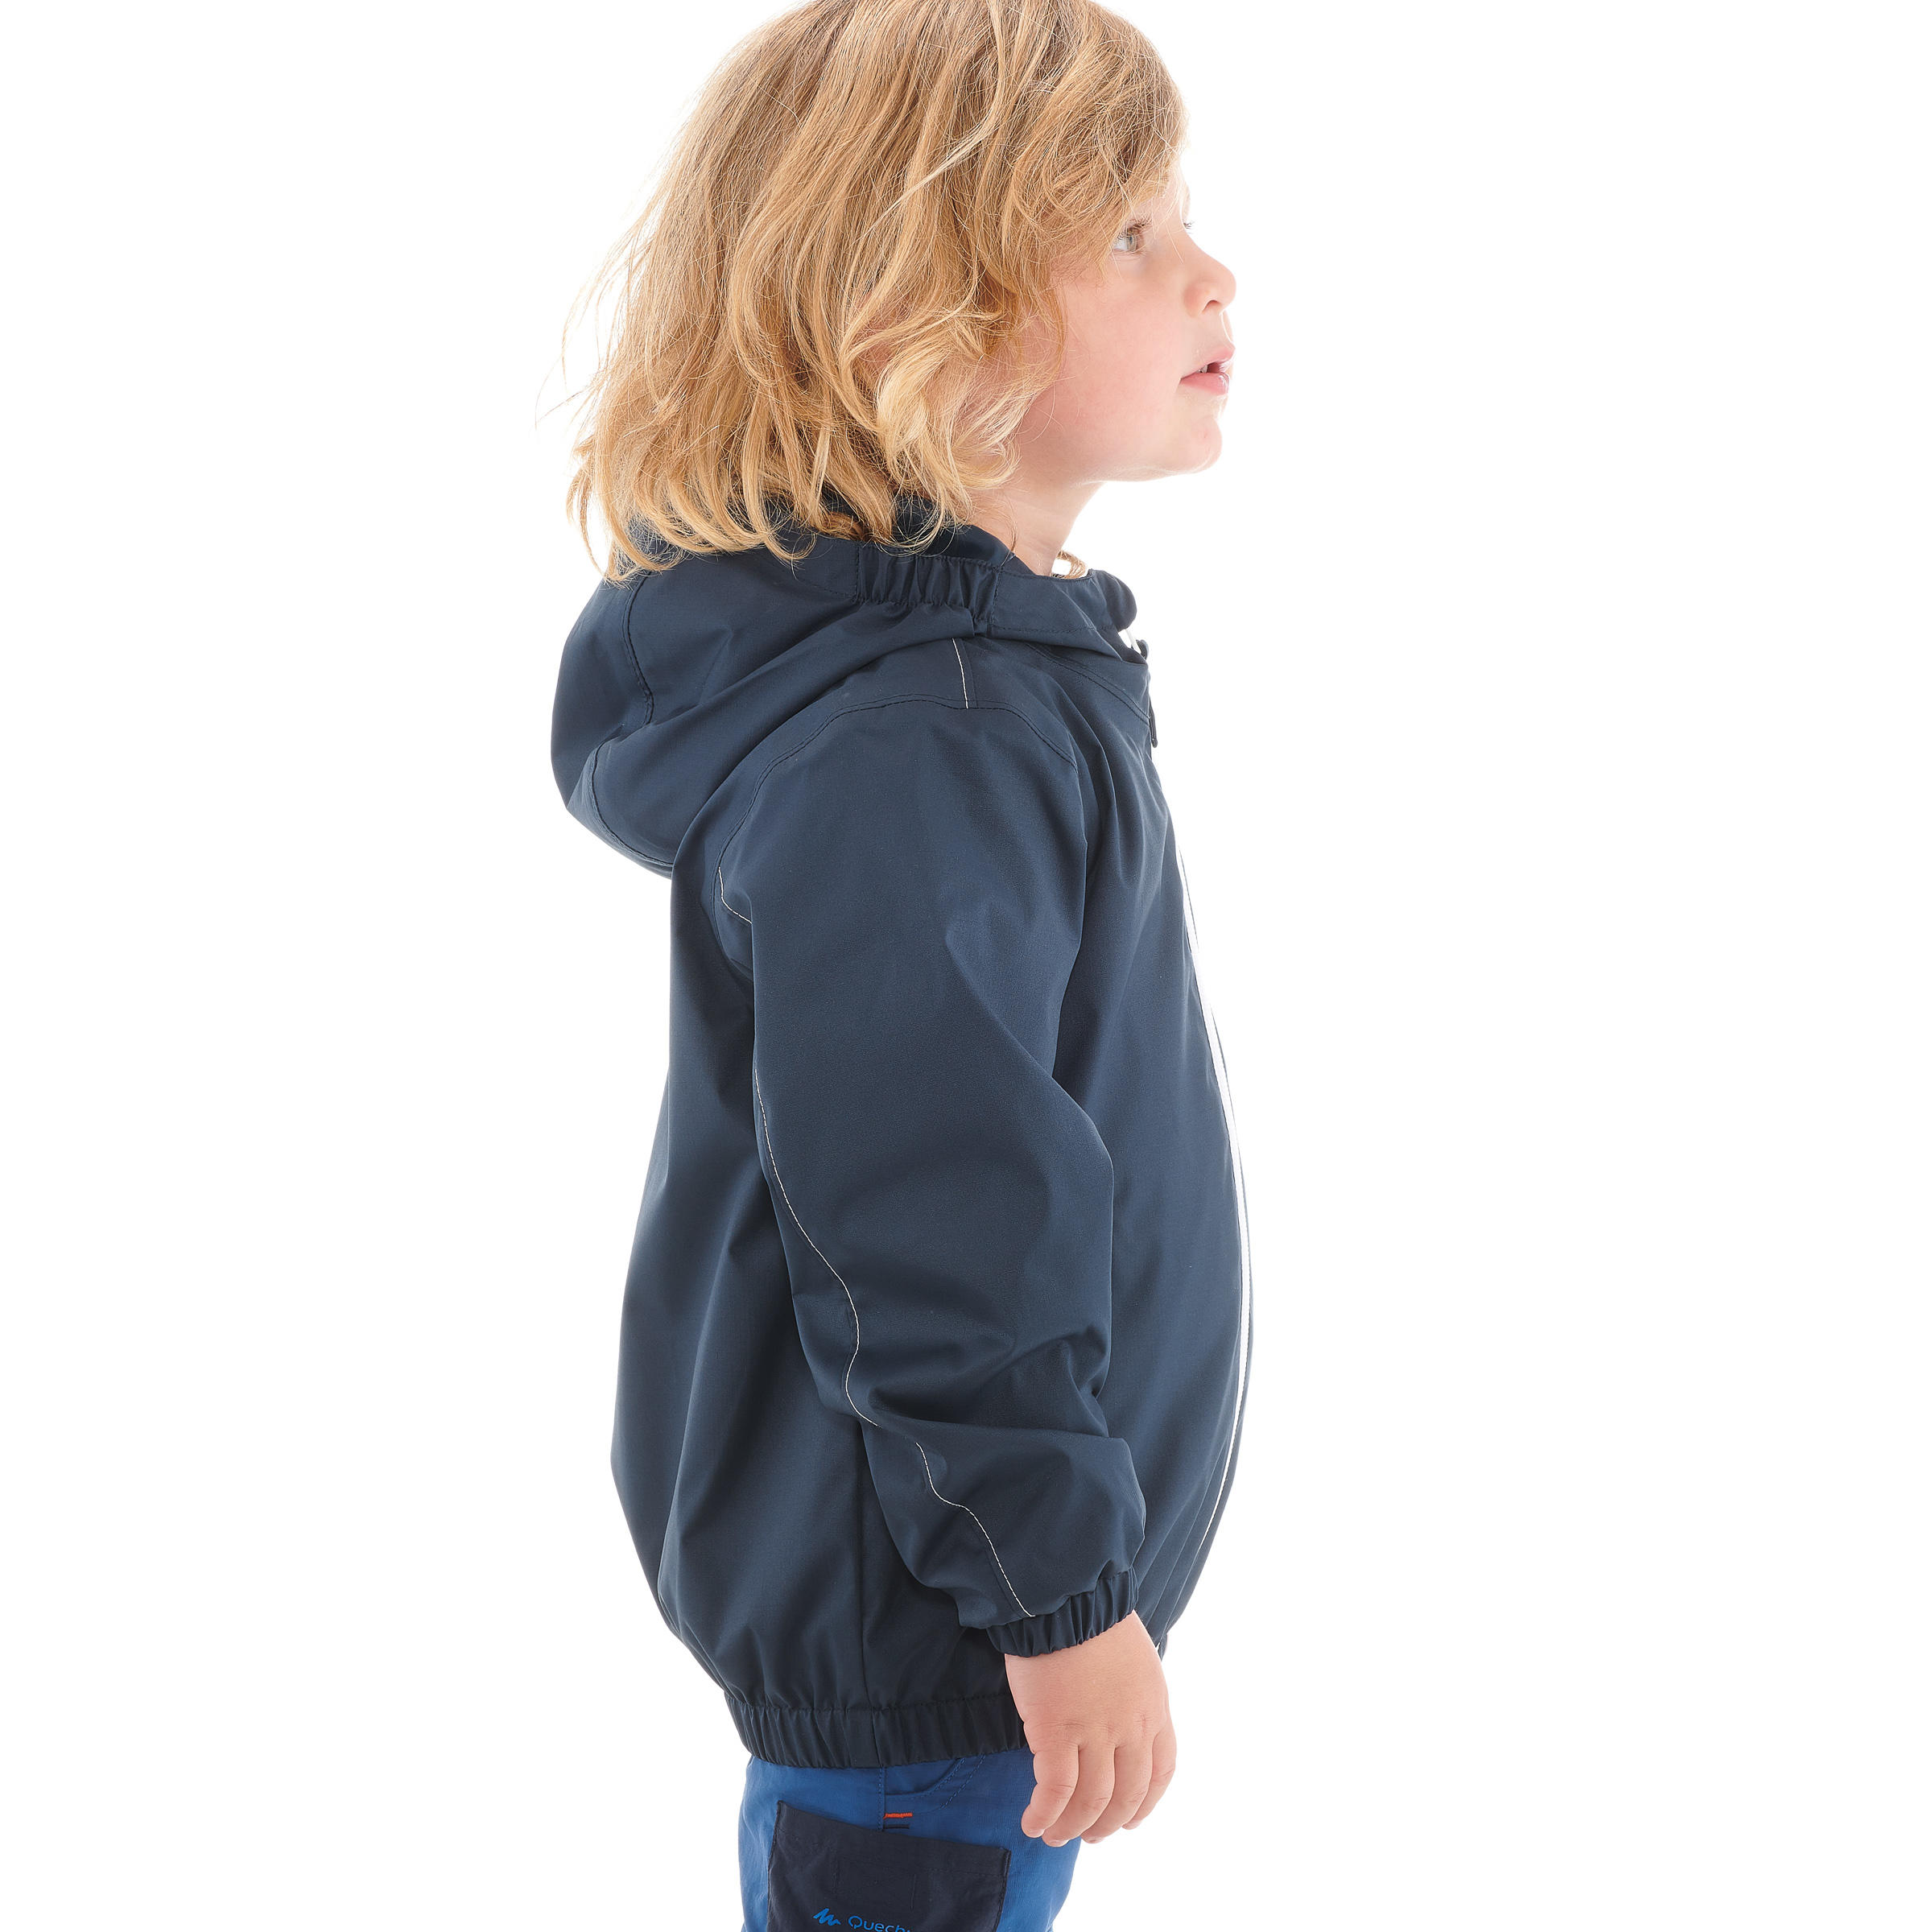 Hike 500 Children's Boy's Waterproof Hiking Jacket – Navy